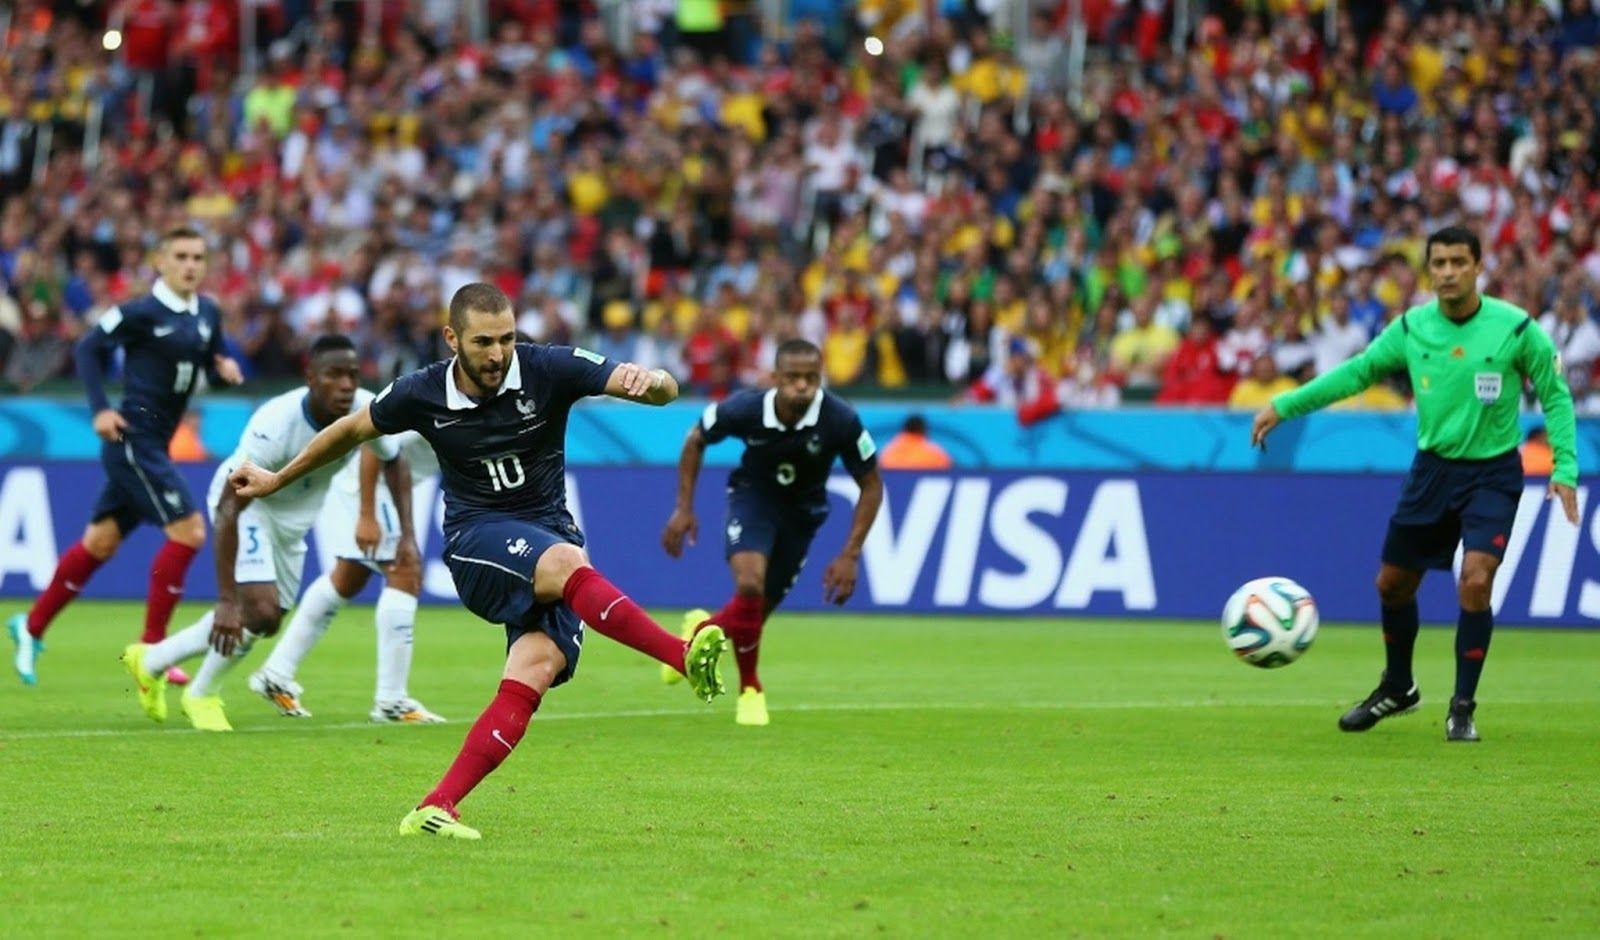 Highlights Wc 2014 France 3 0 Honduras 15 06